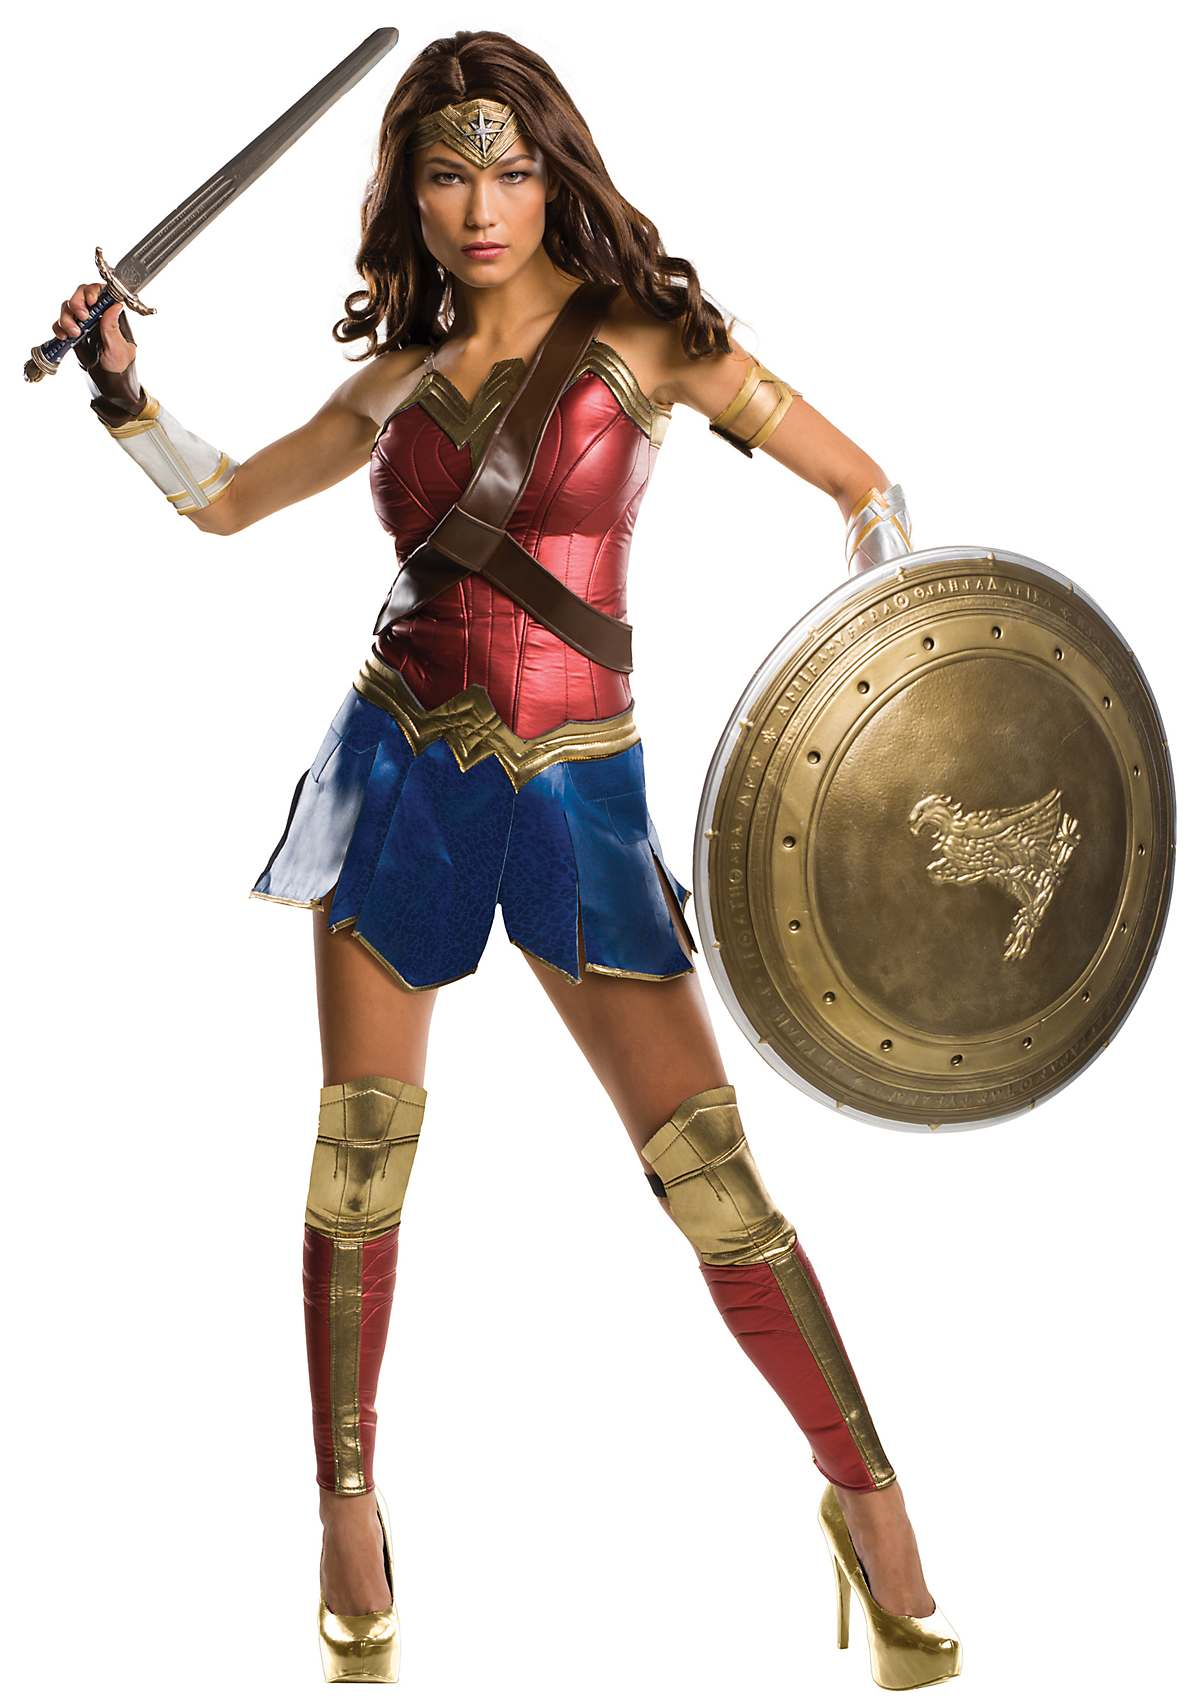 Theatrical Wonder Woman Costume